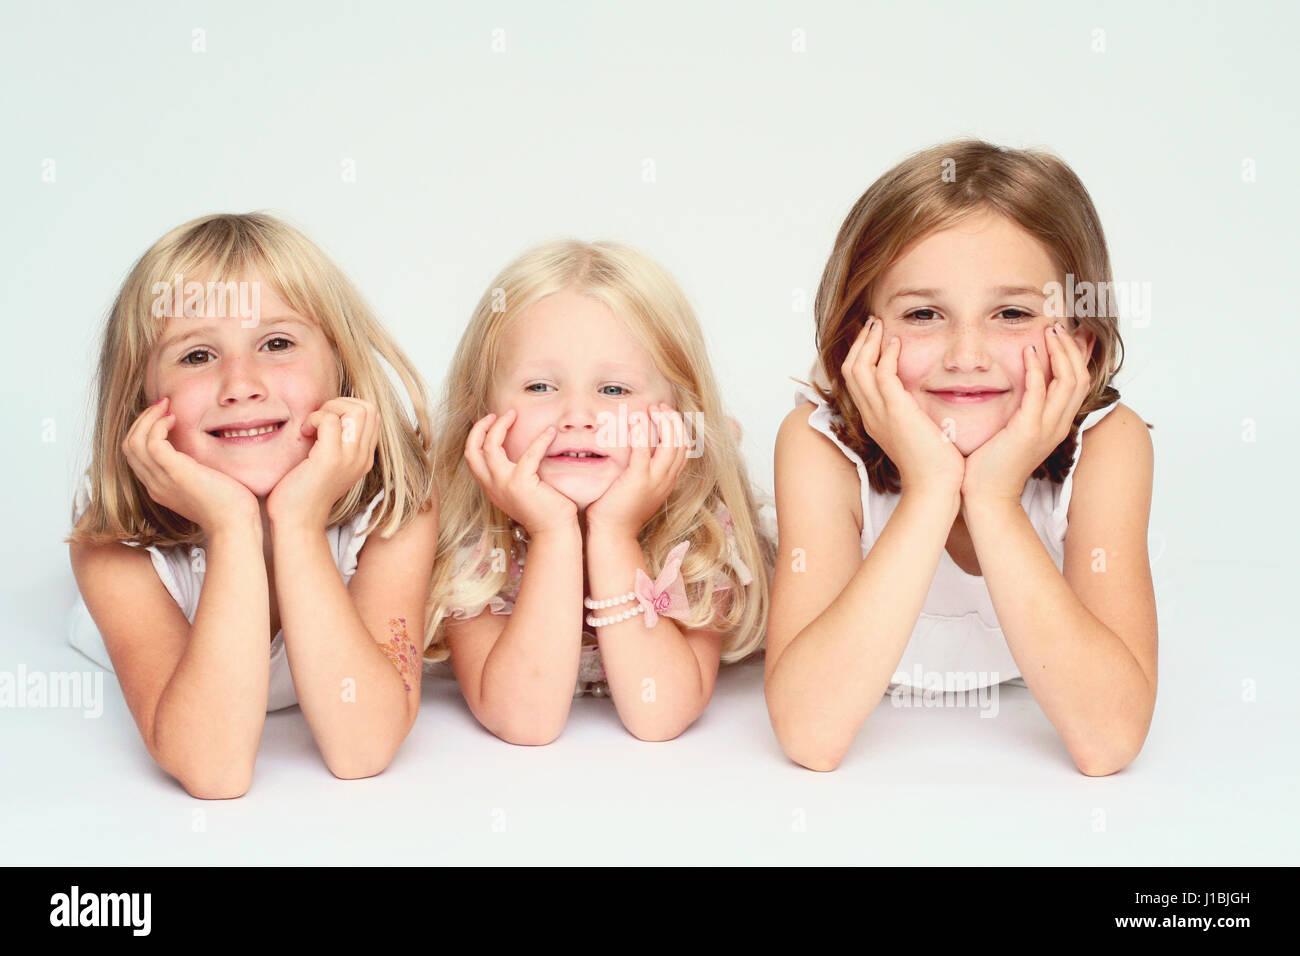 Three sisters portrait lying on their tummies, blonde family, joyful happy family concept - Stock Image